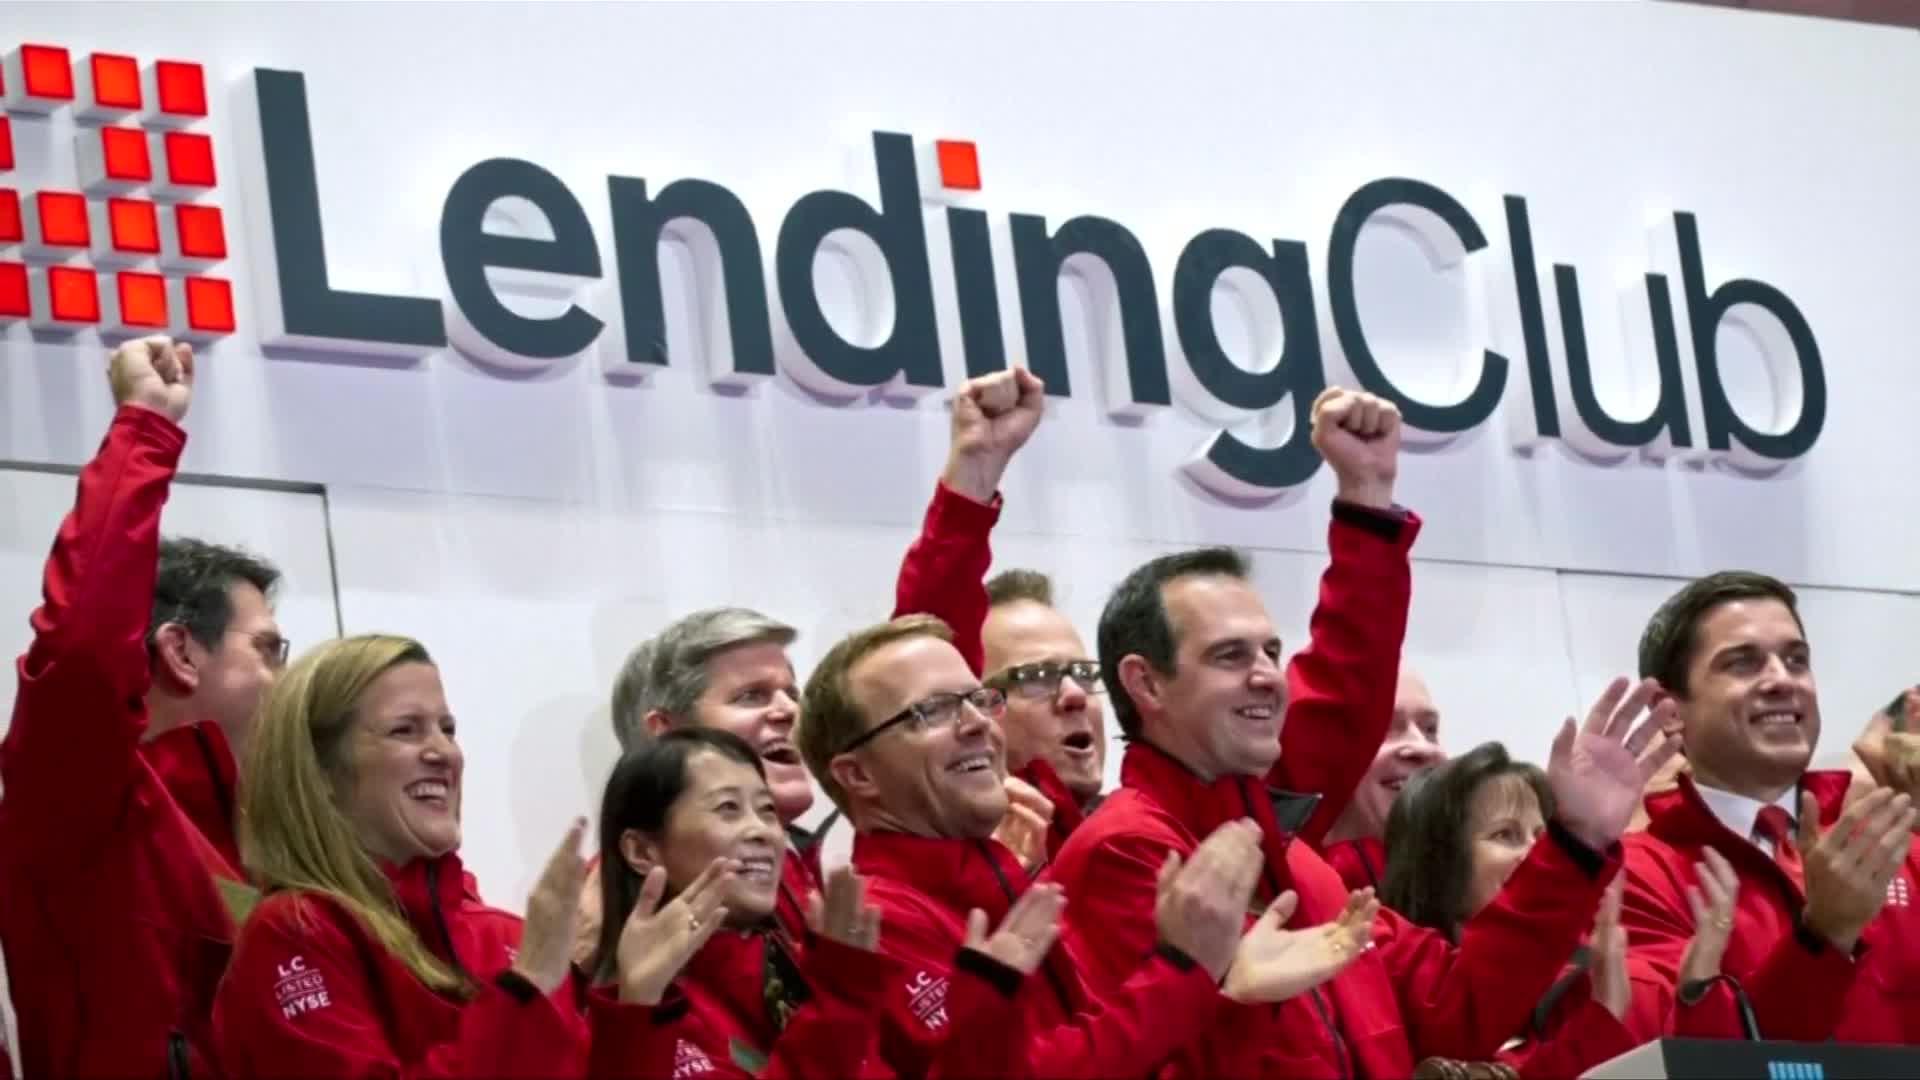 Lending Club names new CEO